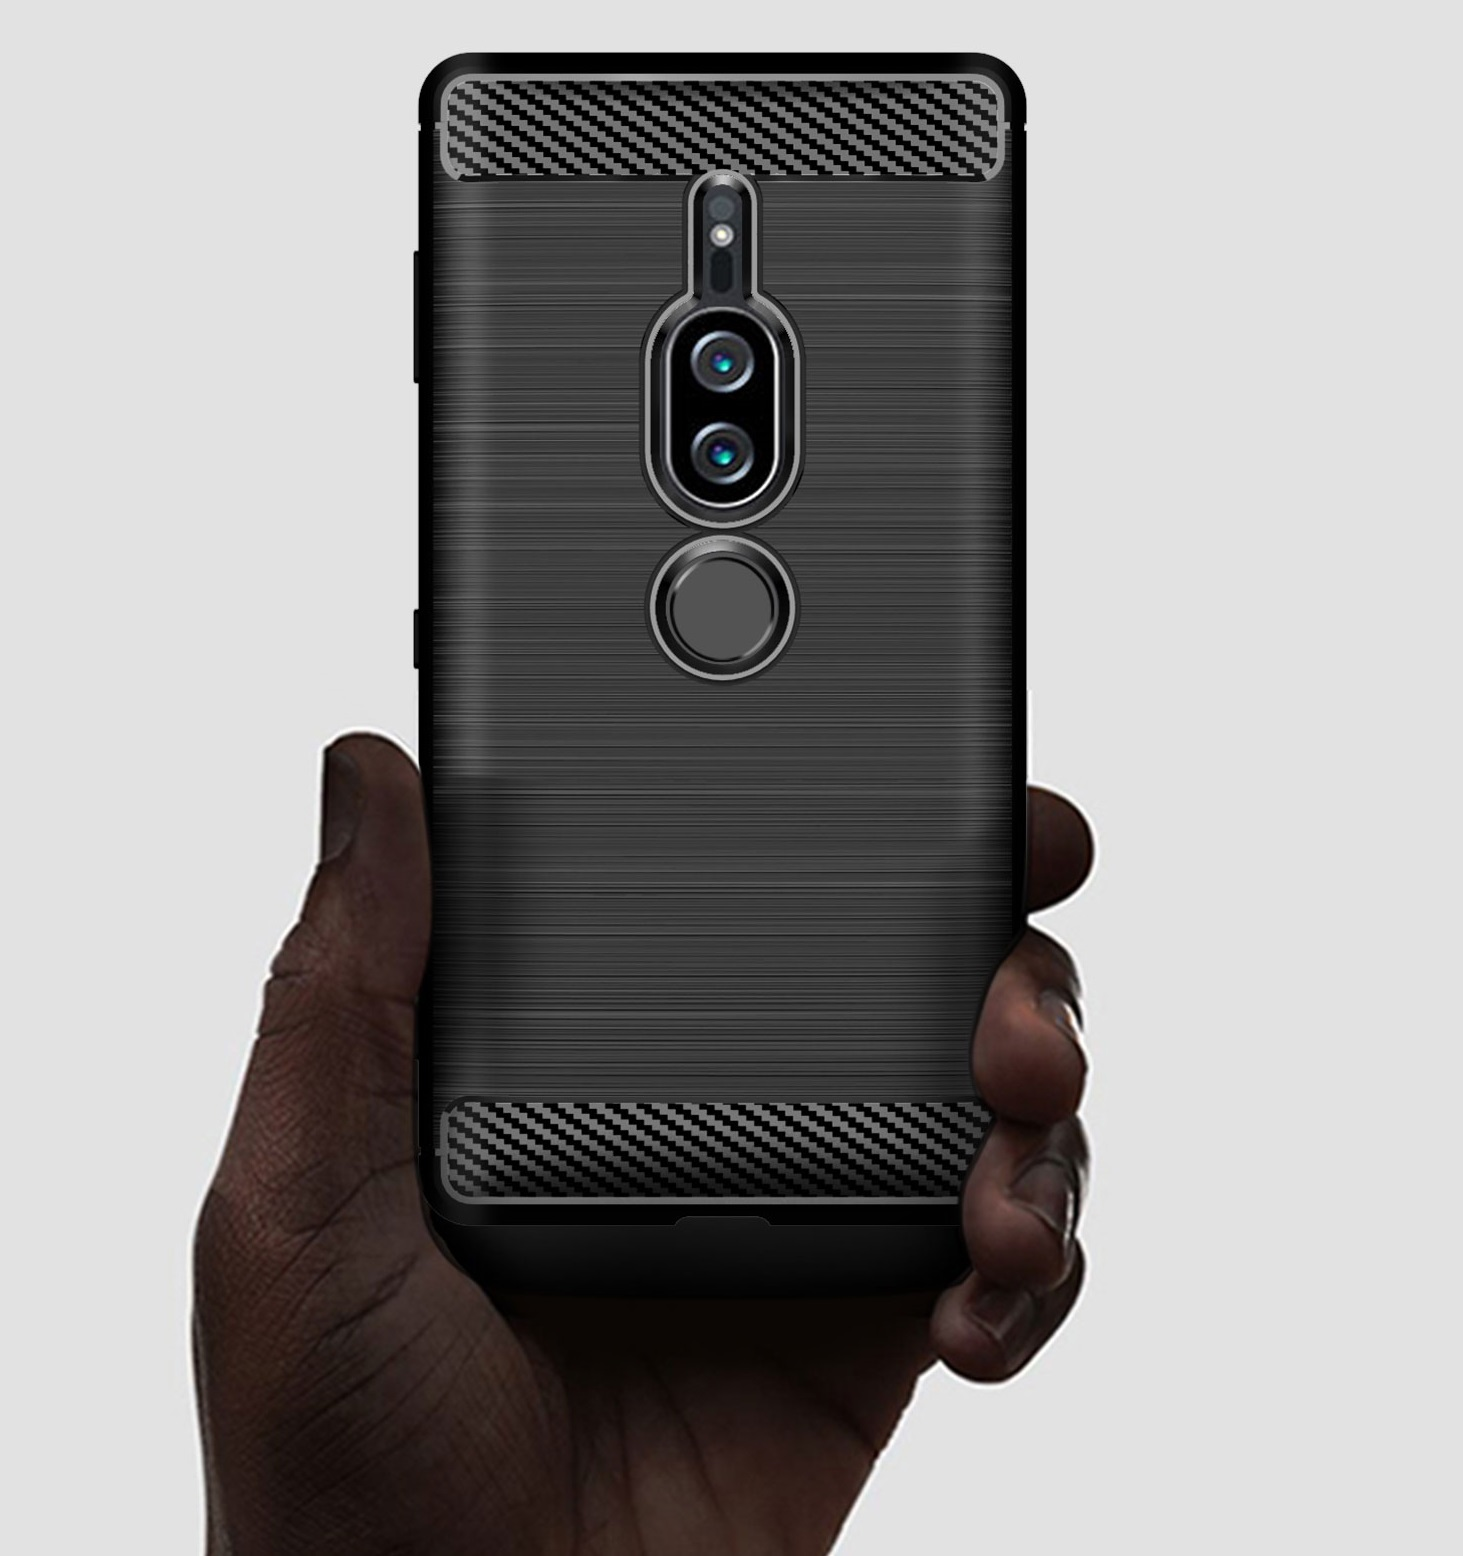 Чехол Sony Xperia XZ2 Premium цвет Black (черный), серия Carbon, Caseport